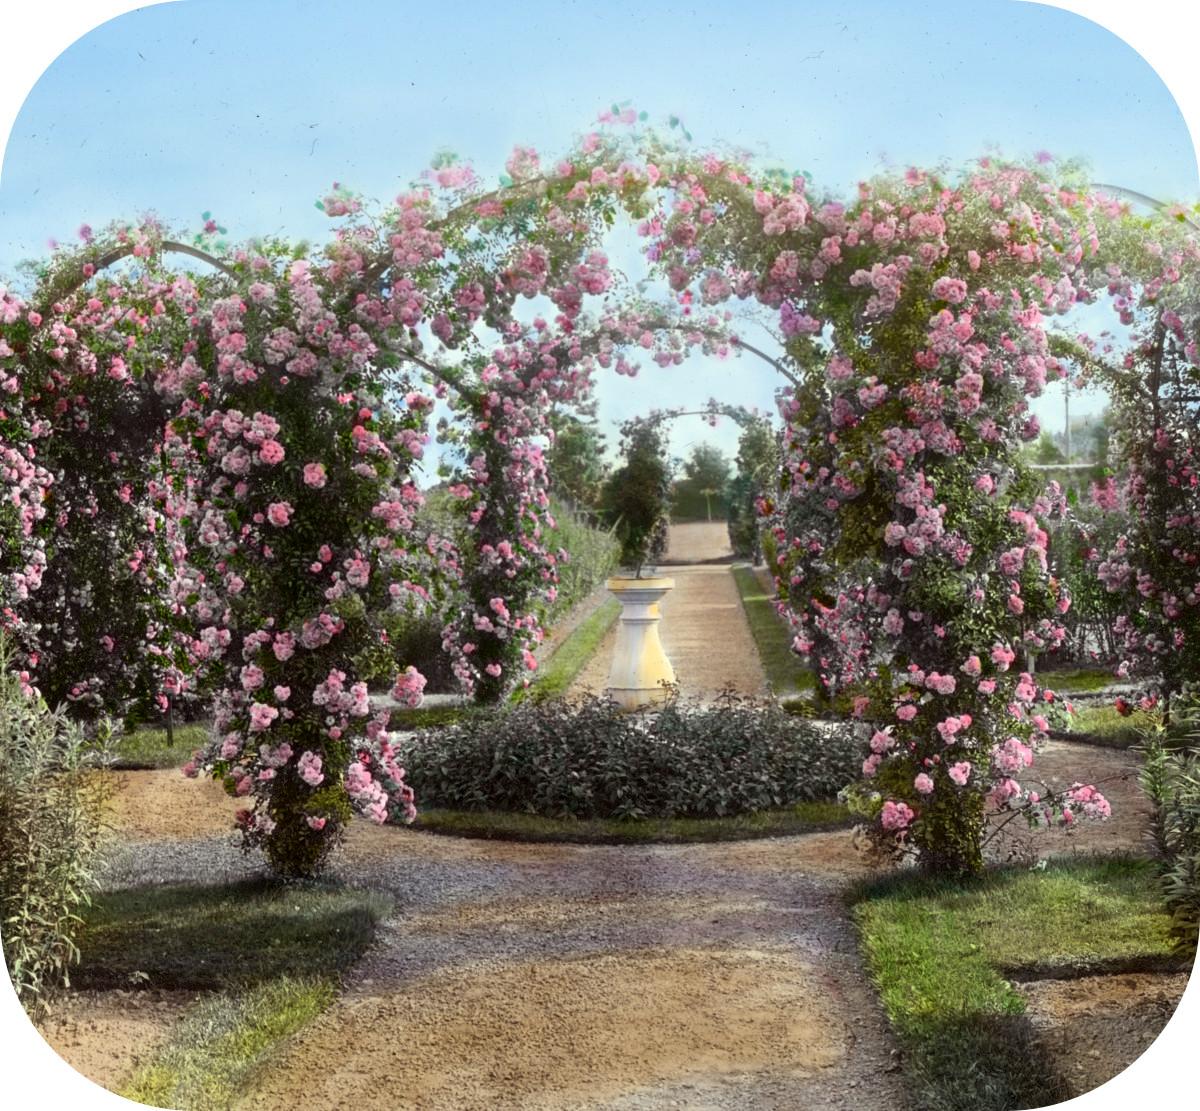 'Armsea Hall,' Charles Frederick Hoffman Jr. house, Narragansett Bay, Newport, Rhode Island. Sundial